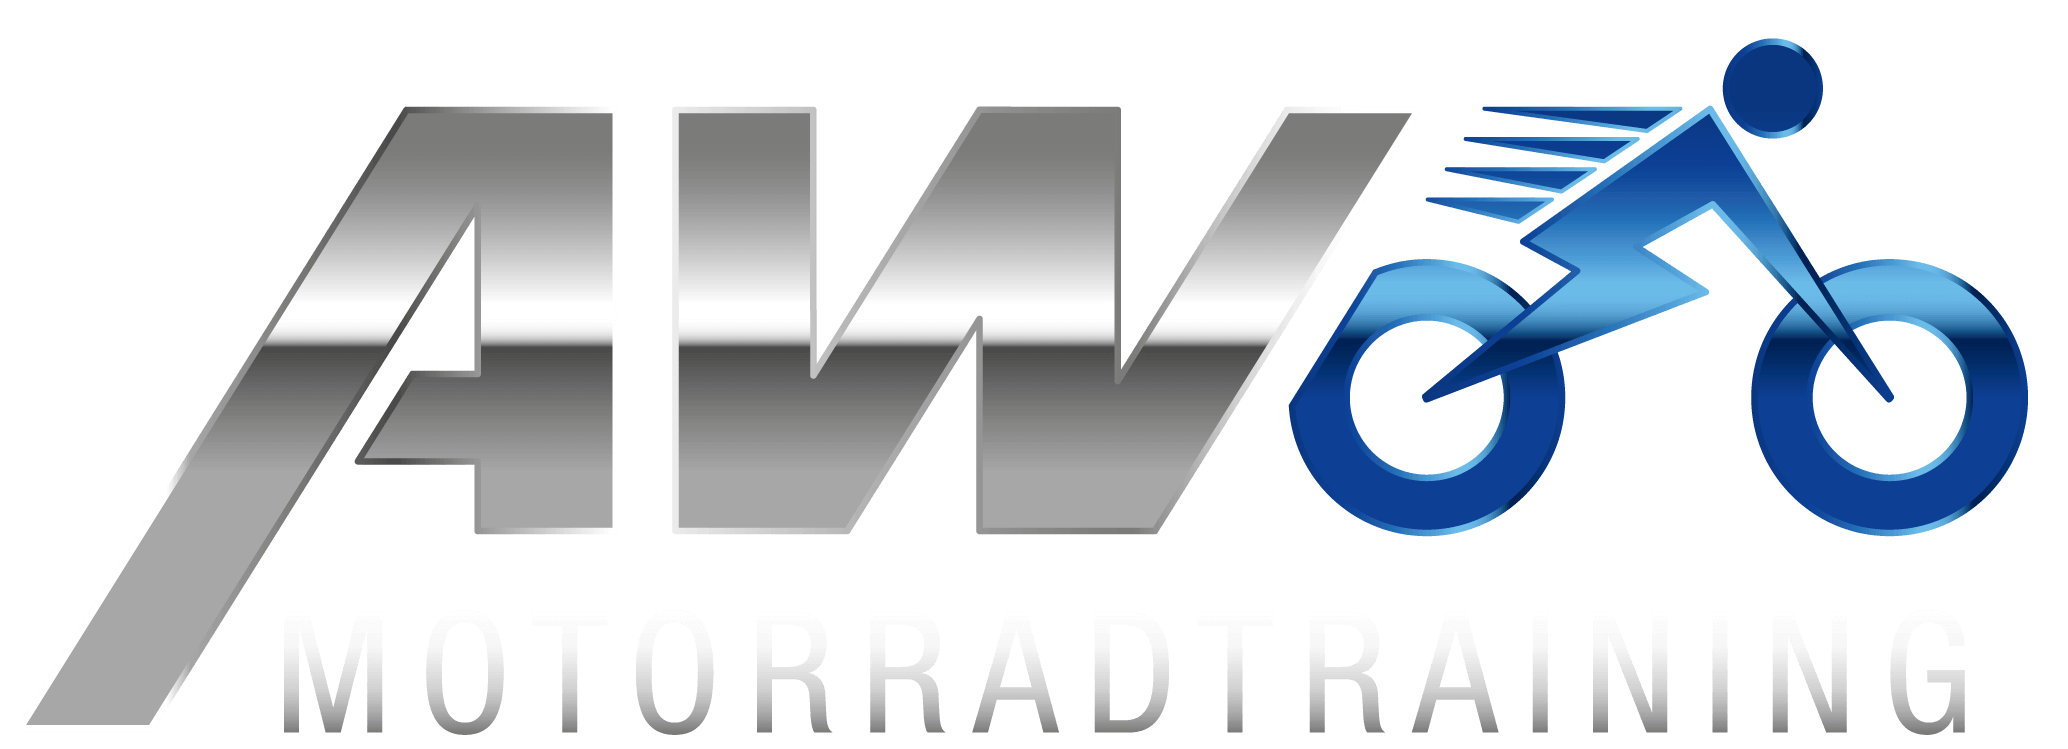 AW-Motorradtraining